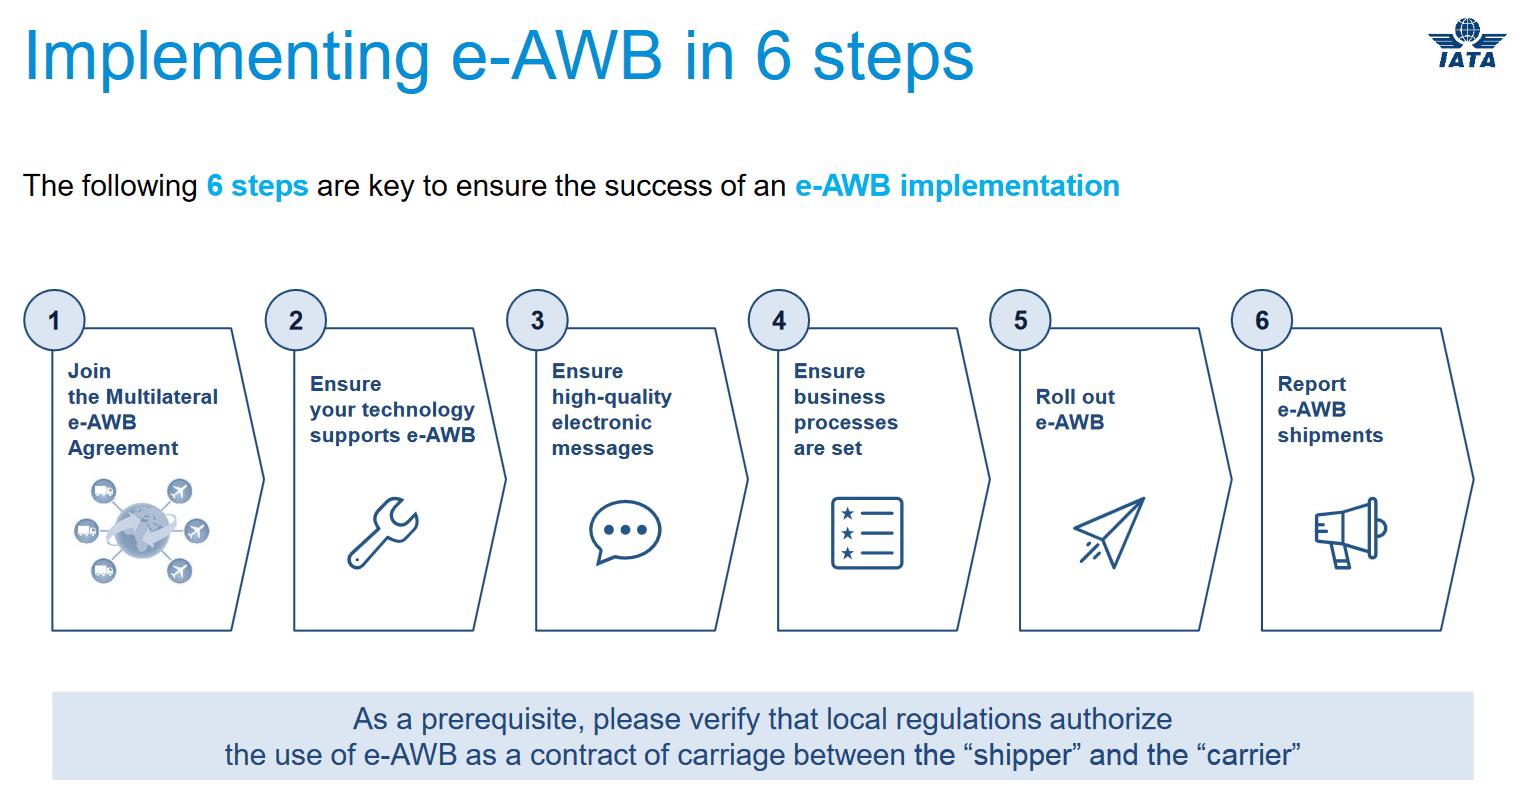 e-AWB implementation